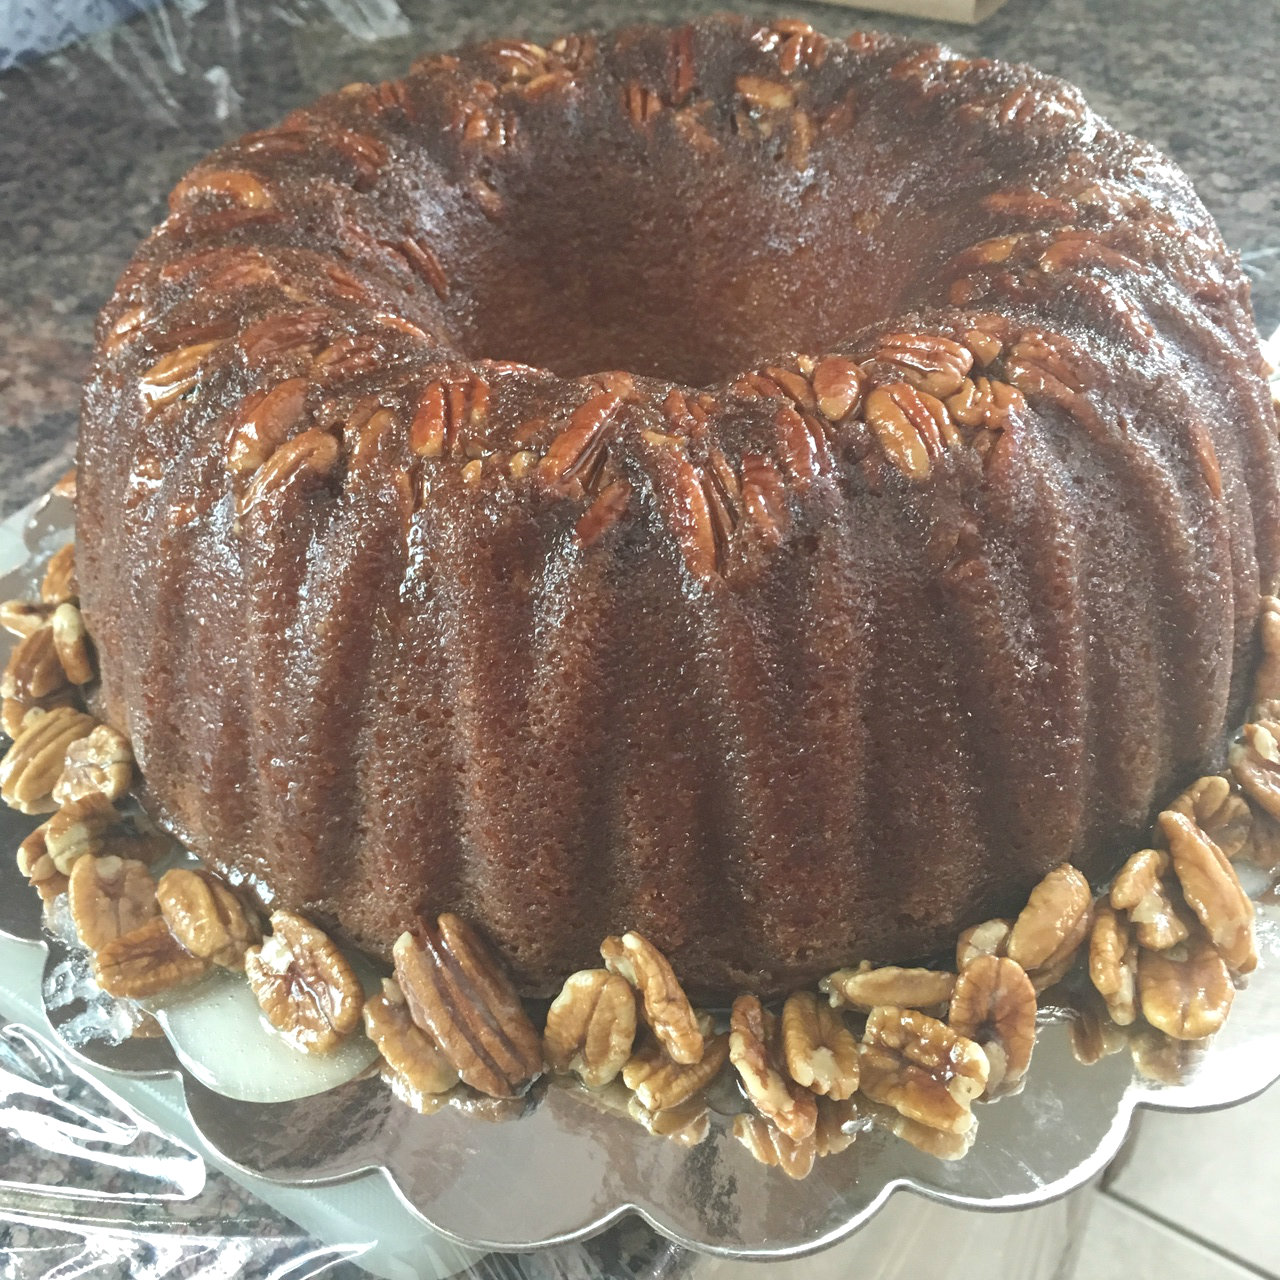 Rock'n RumChata! Rum Cake